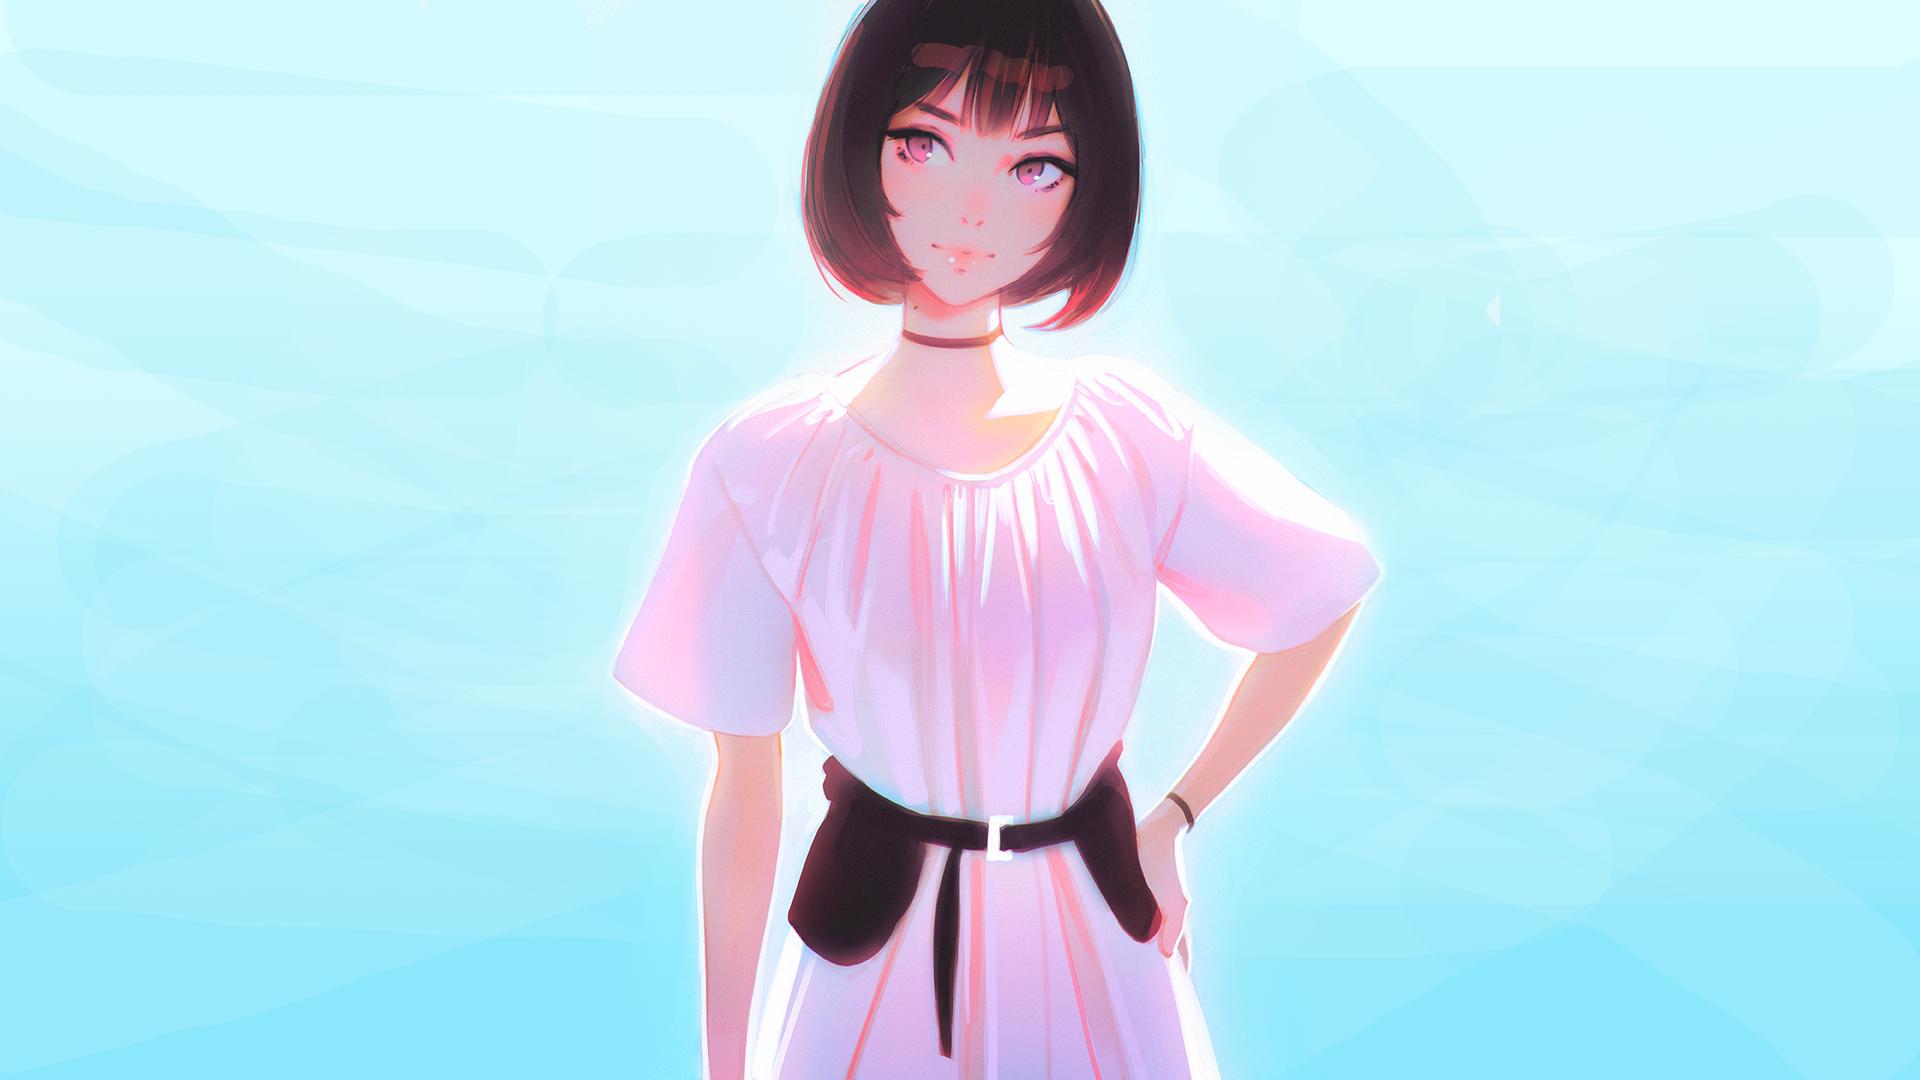 Anime 1920x1080 digital art anime girls fantasy art artwork original characters schoolgirl minimalism Ilya Kuvshinov